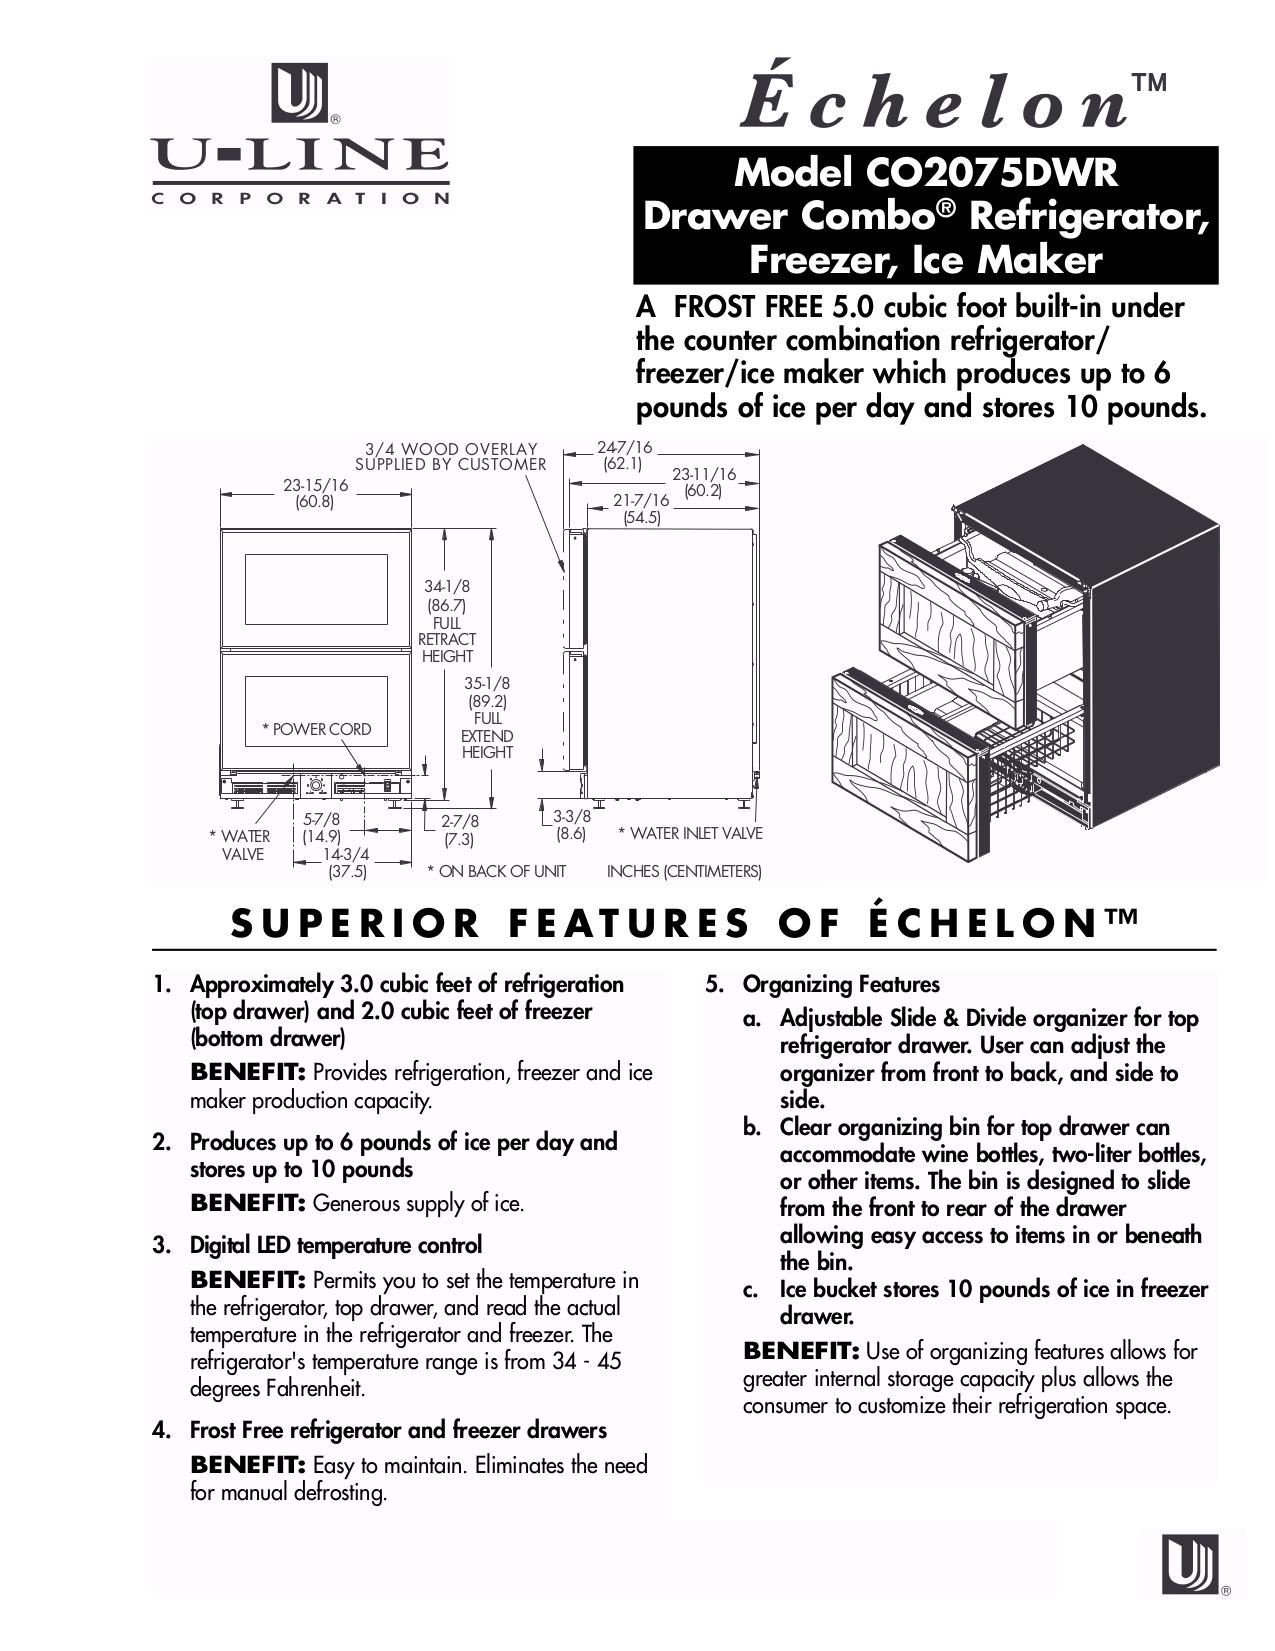 pdf for U-Line Refrigerator Echelon CO2075DWR manual